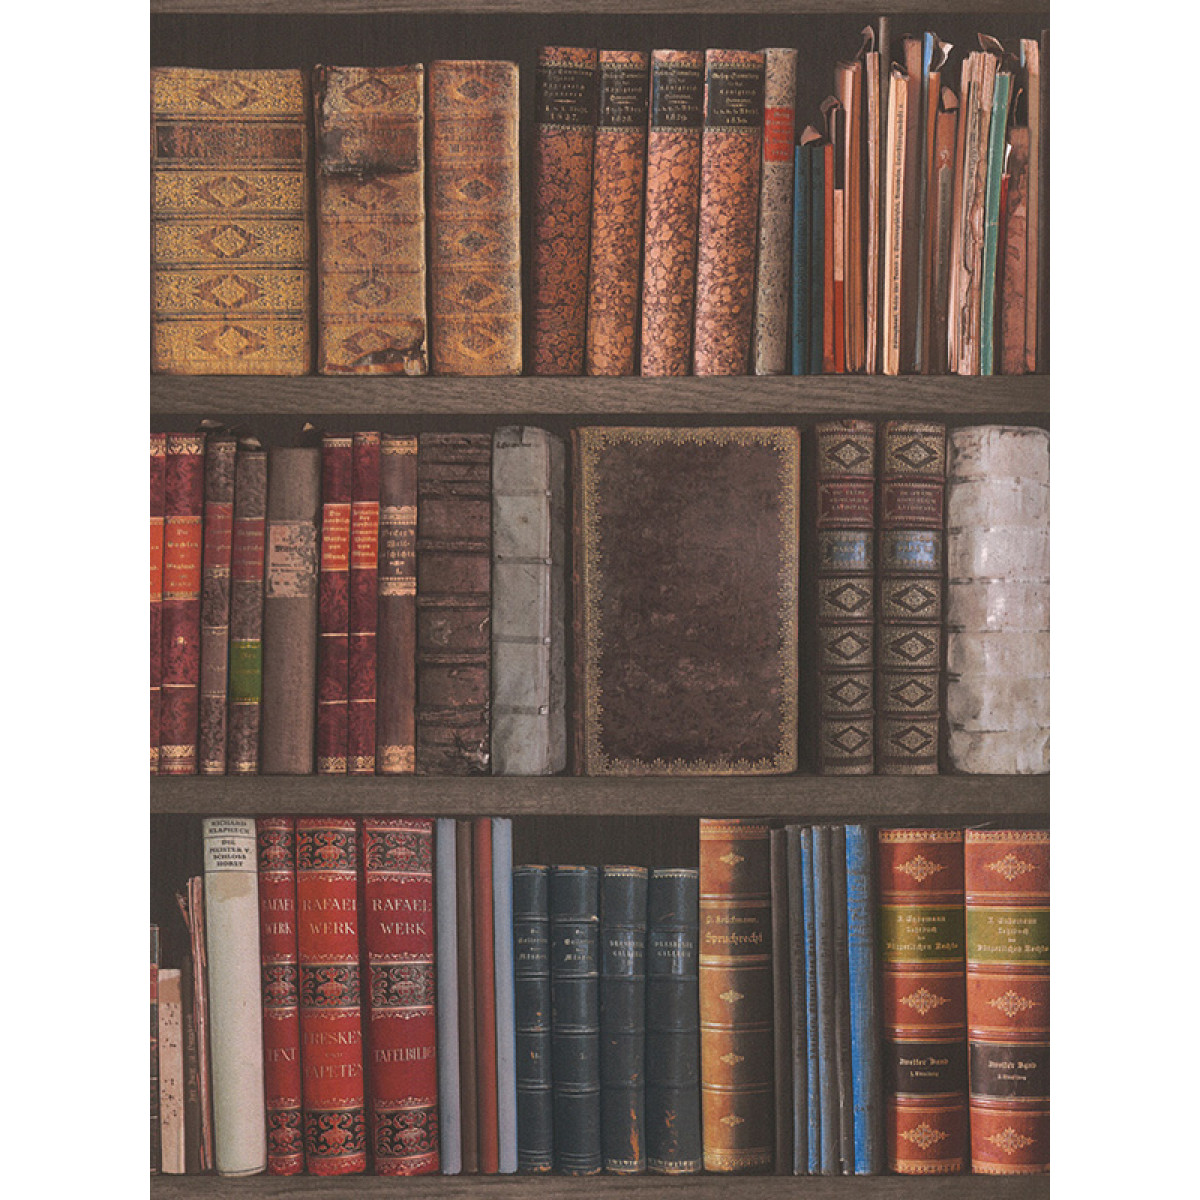 Rasch Library Books Wallpaper 934809 Feature Bedroom